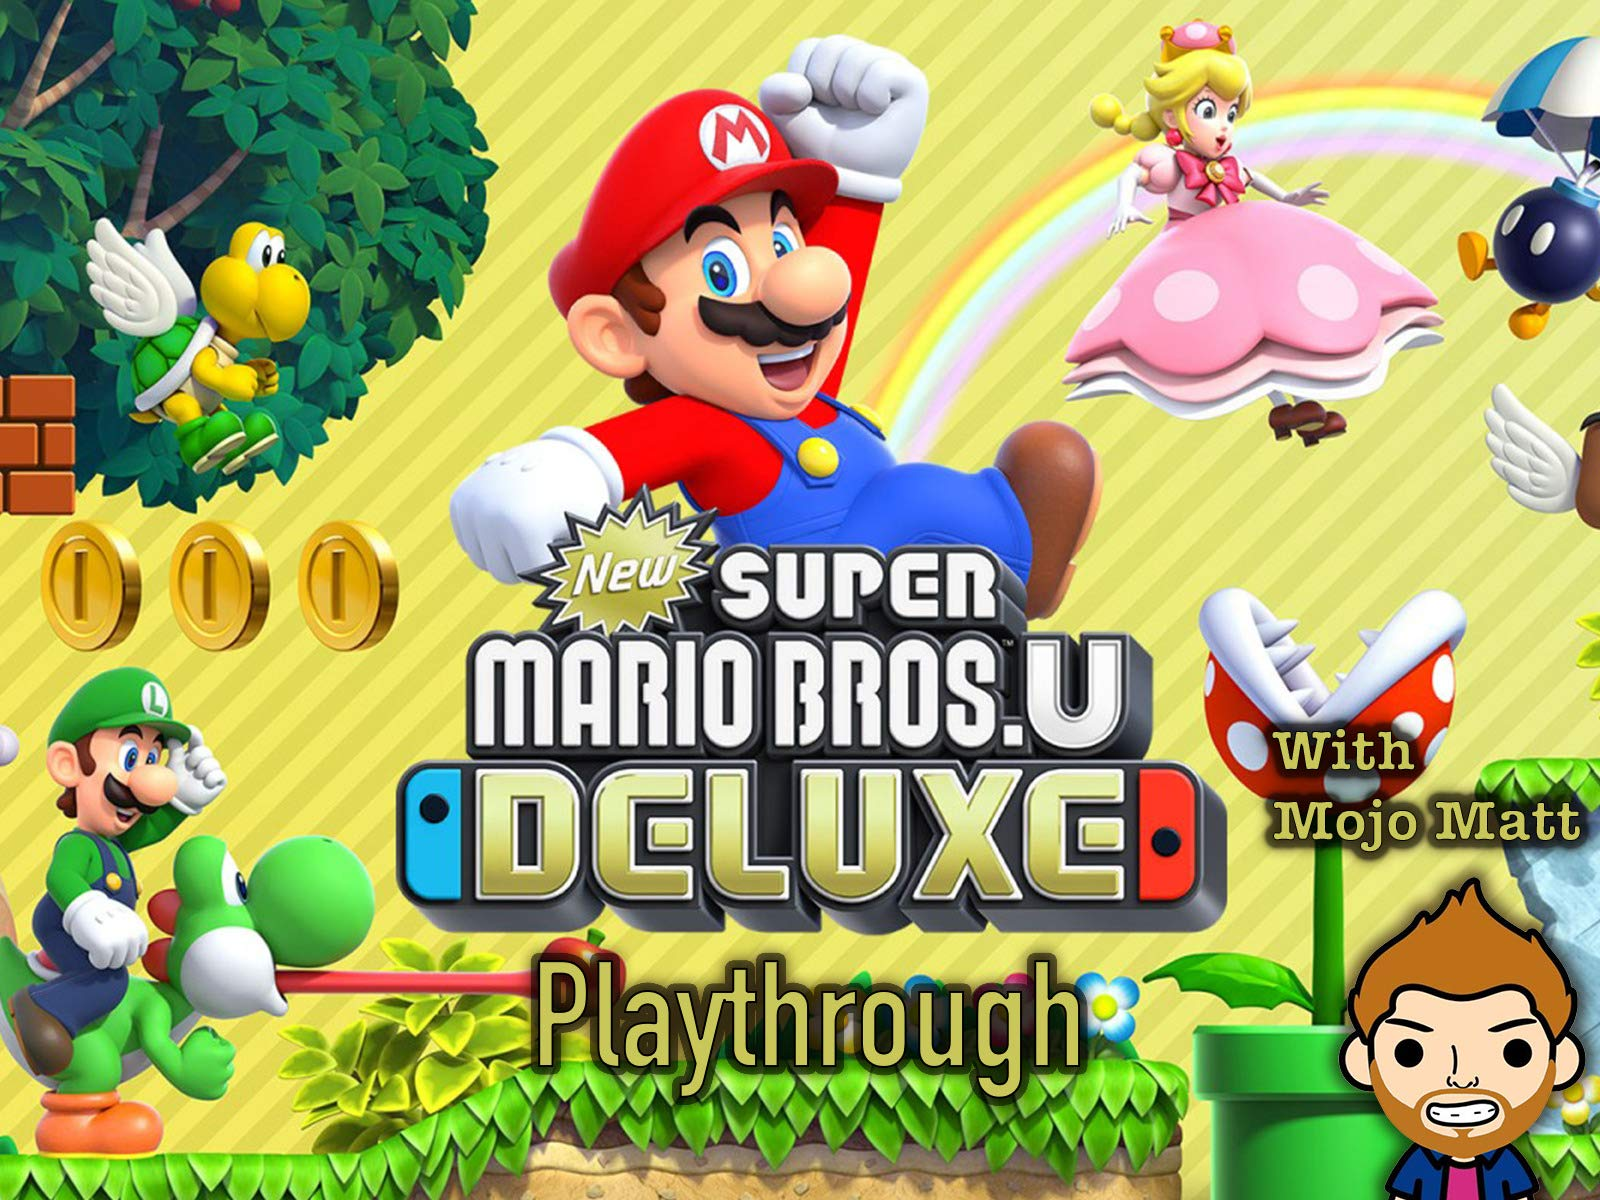 New Super Mario Bros. U Deluxe Playthrough With Mojo Matt - Season 1